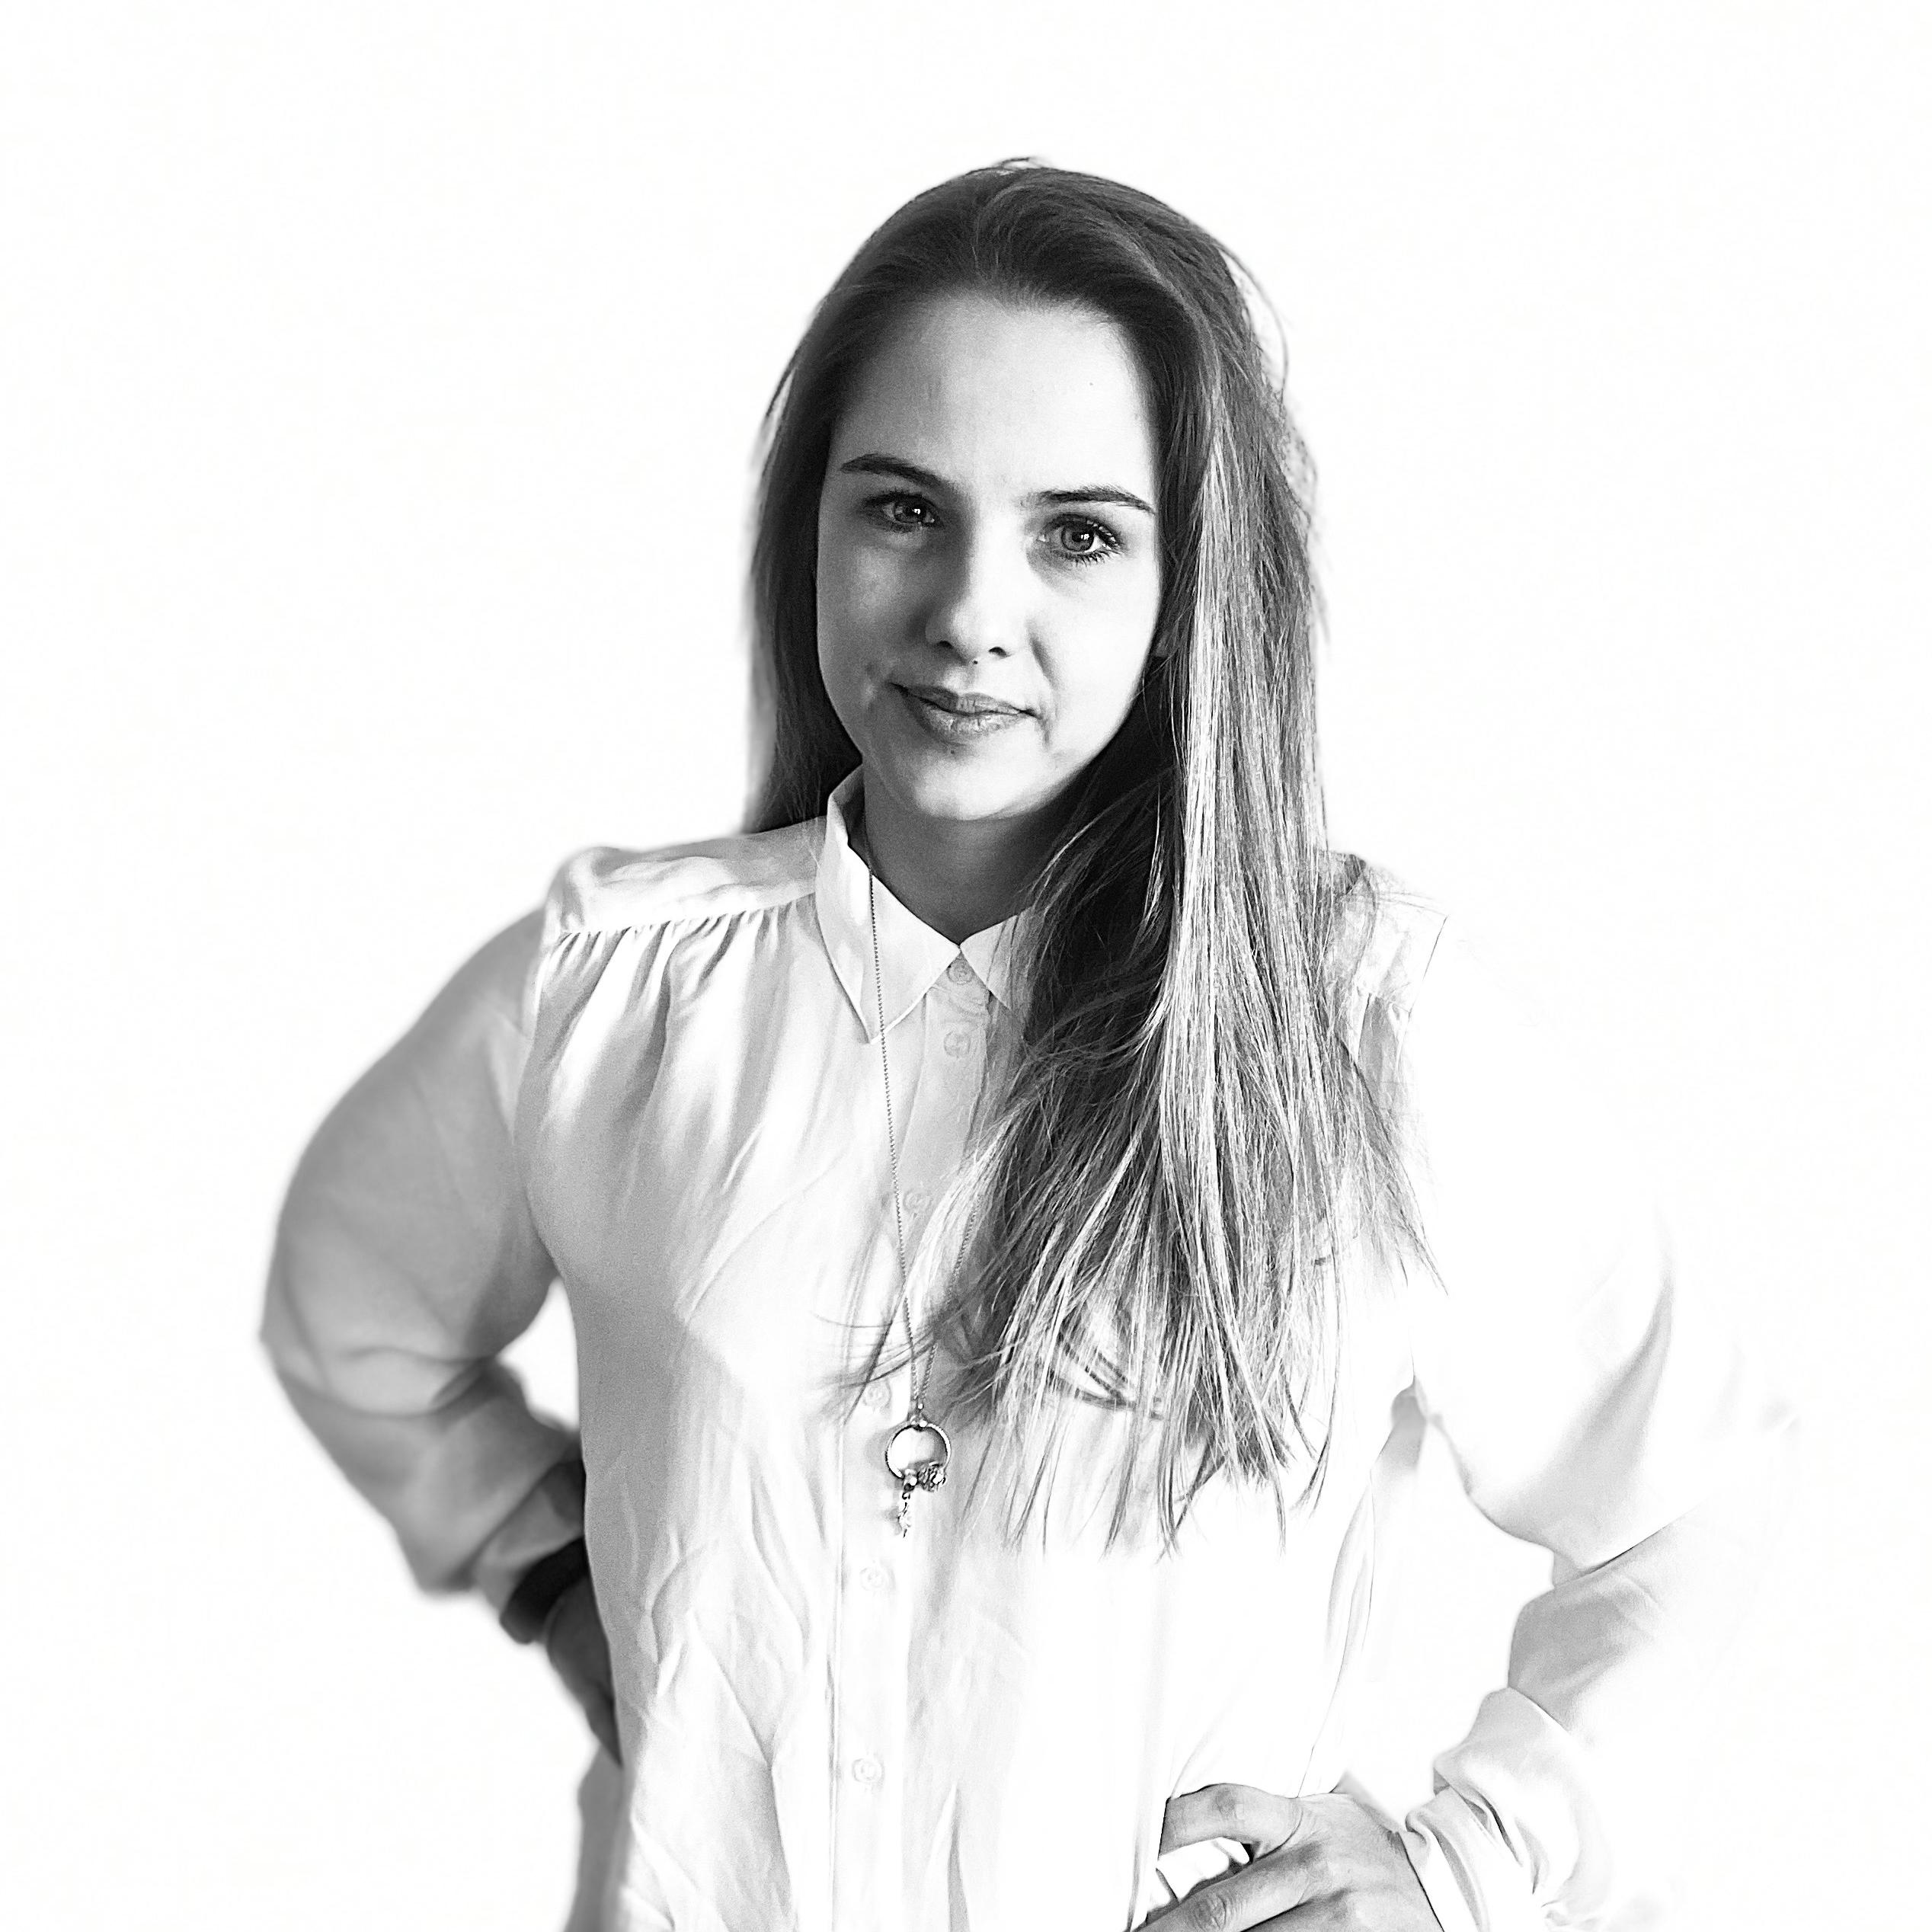 Lina Leskovec